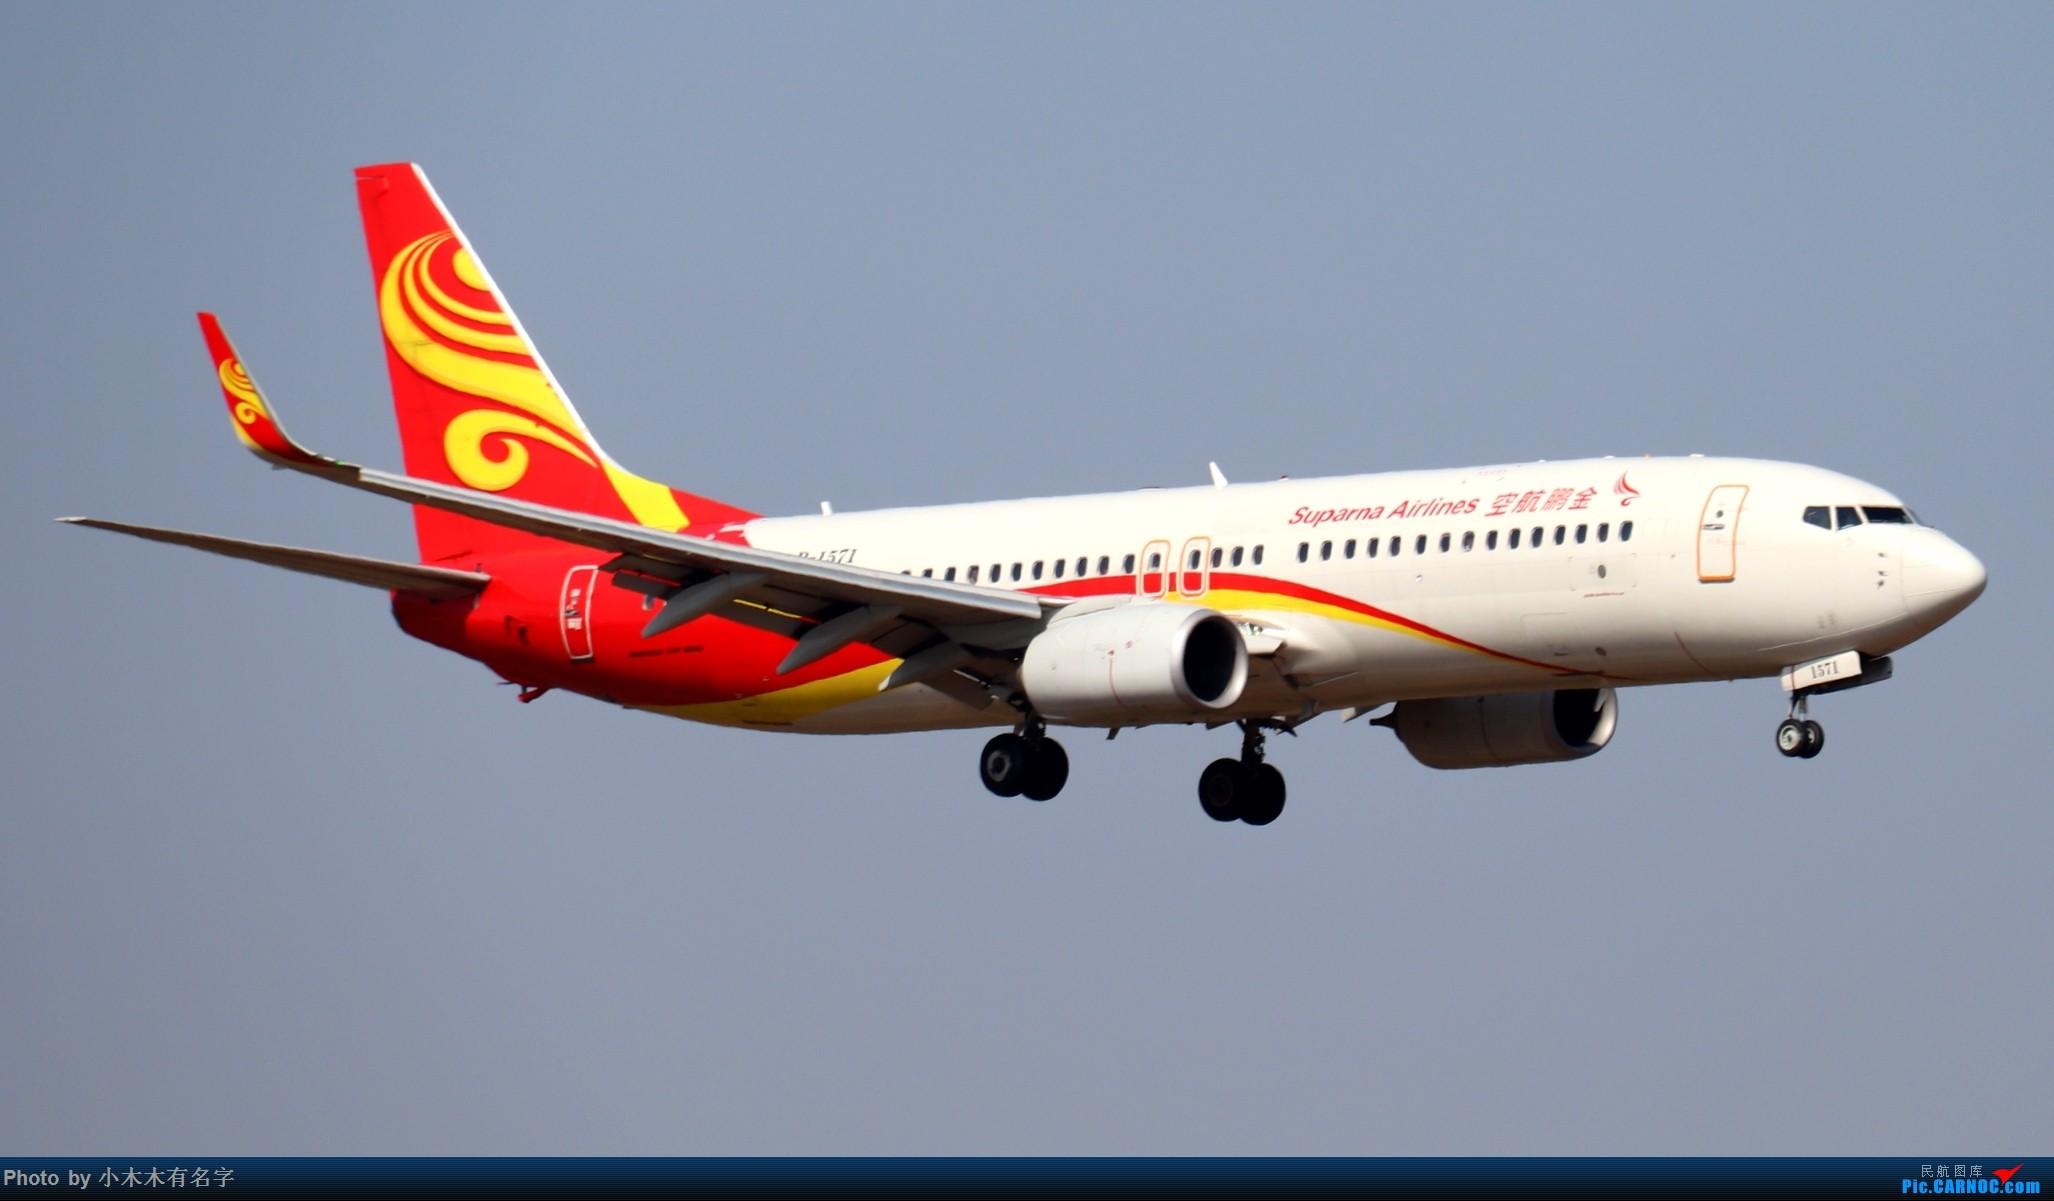 Re:[原创]2019冬天的海口美兰 BOEING 737-800 B-1571 中国海口美兰国际机场